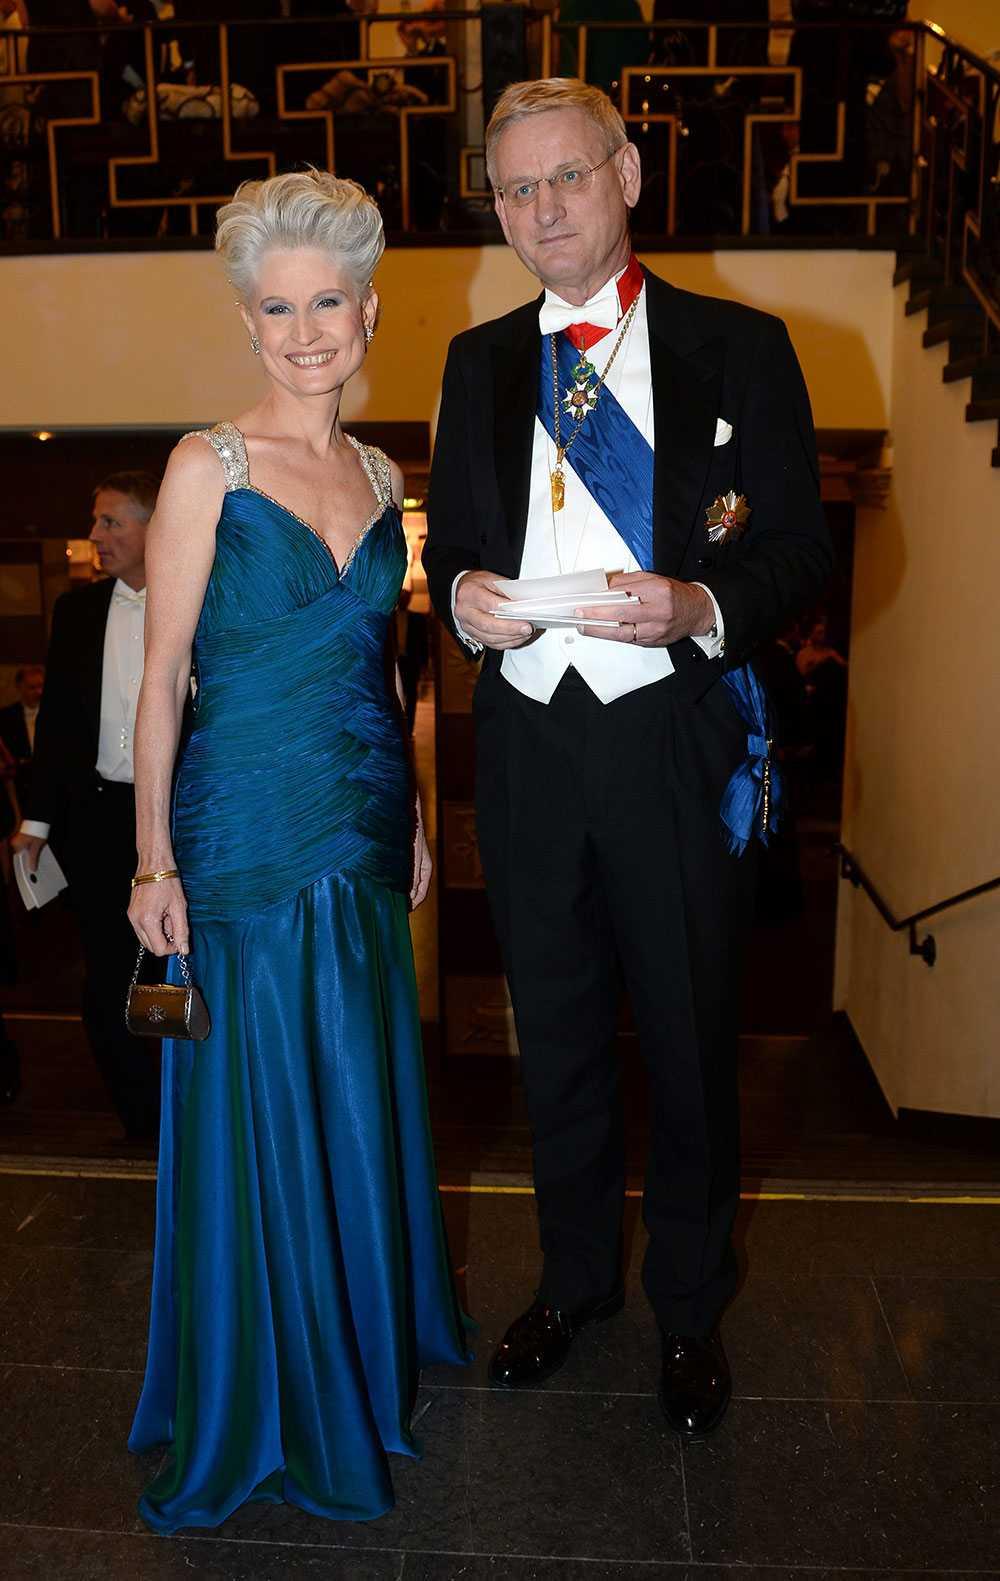 Anna Maria Corazza Bildt med utrikesministern Carl Bildt.